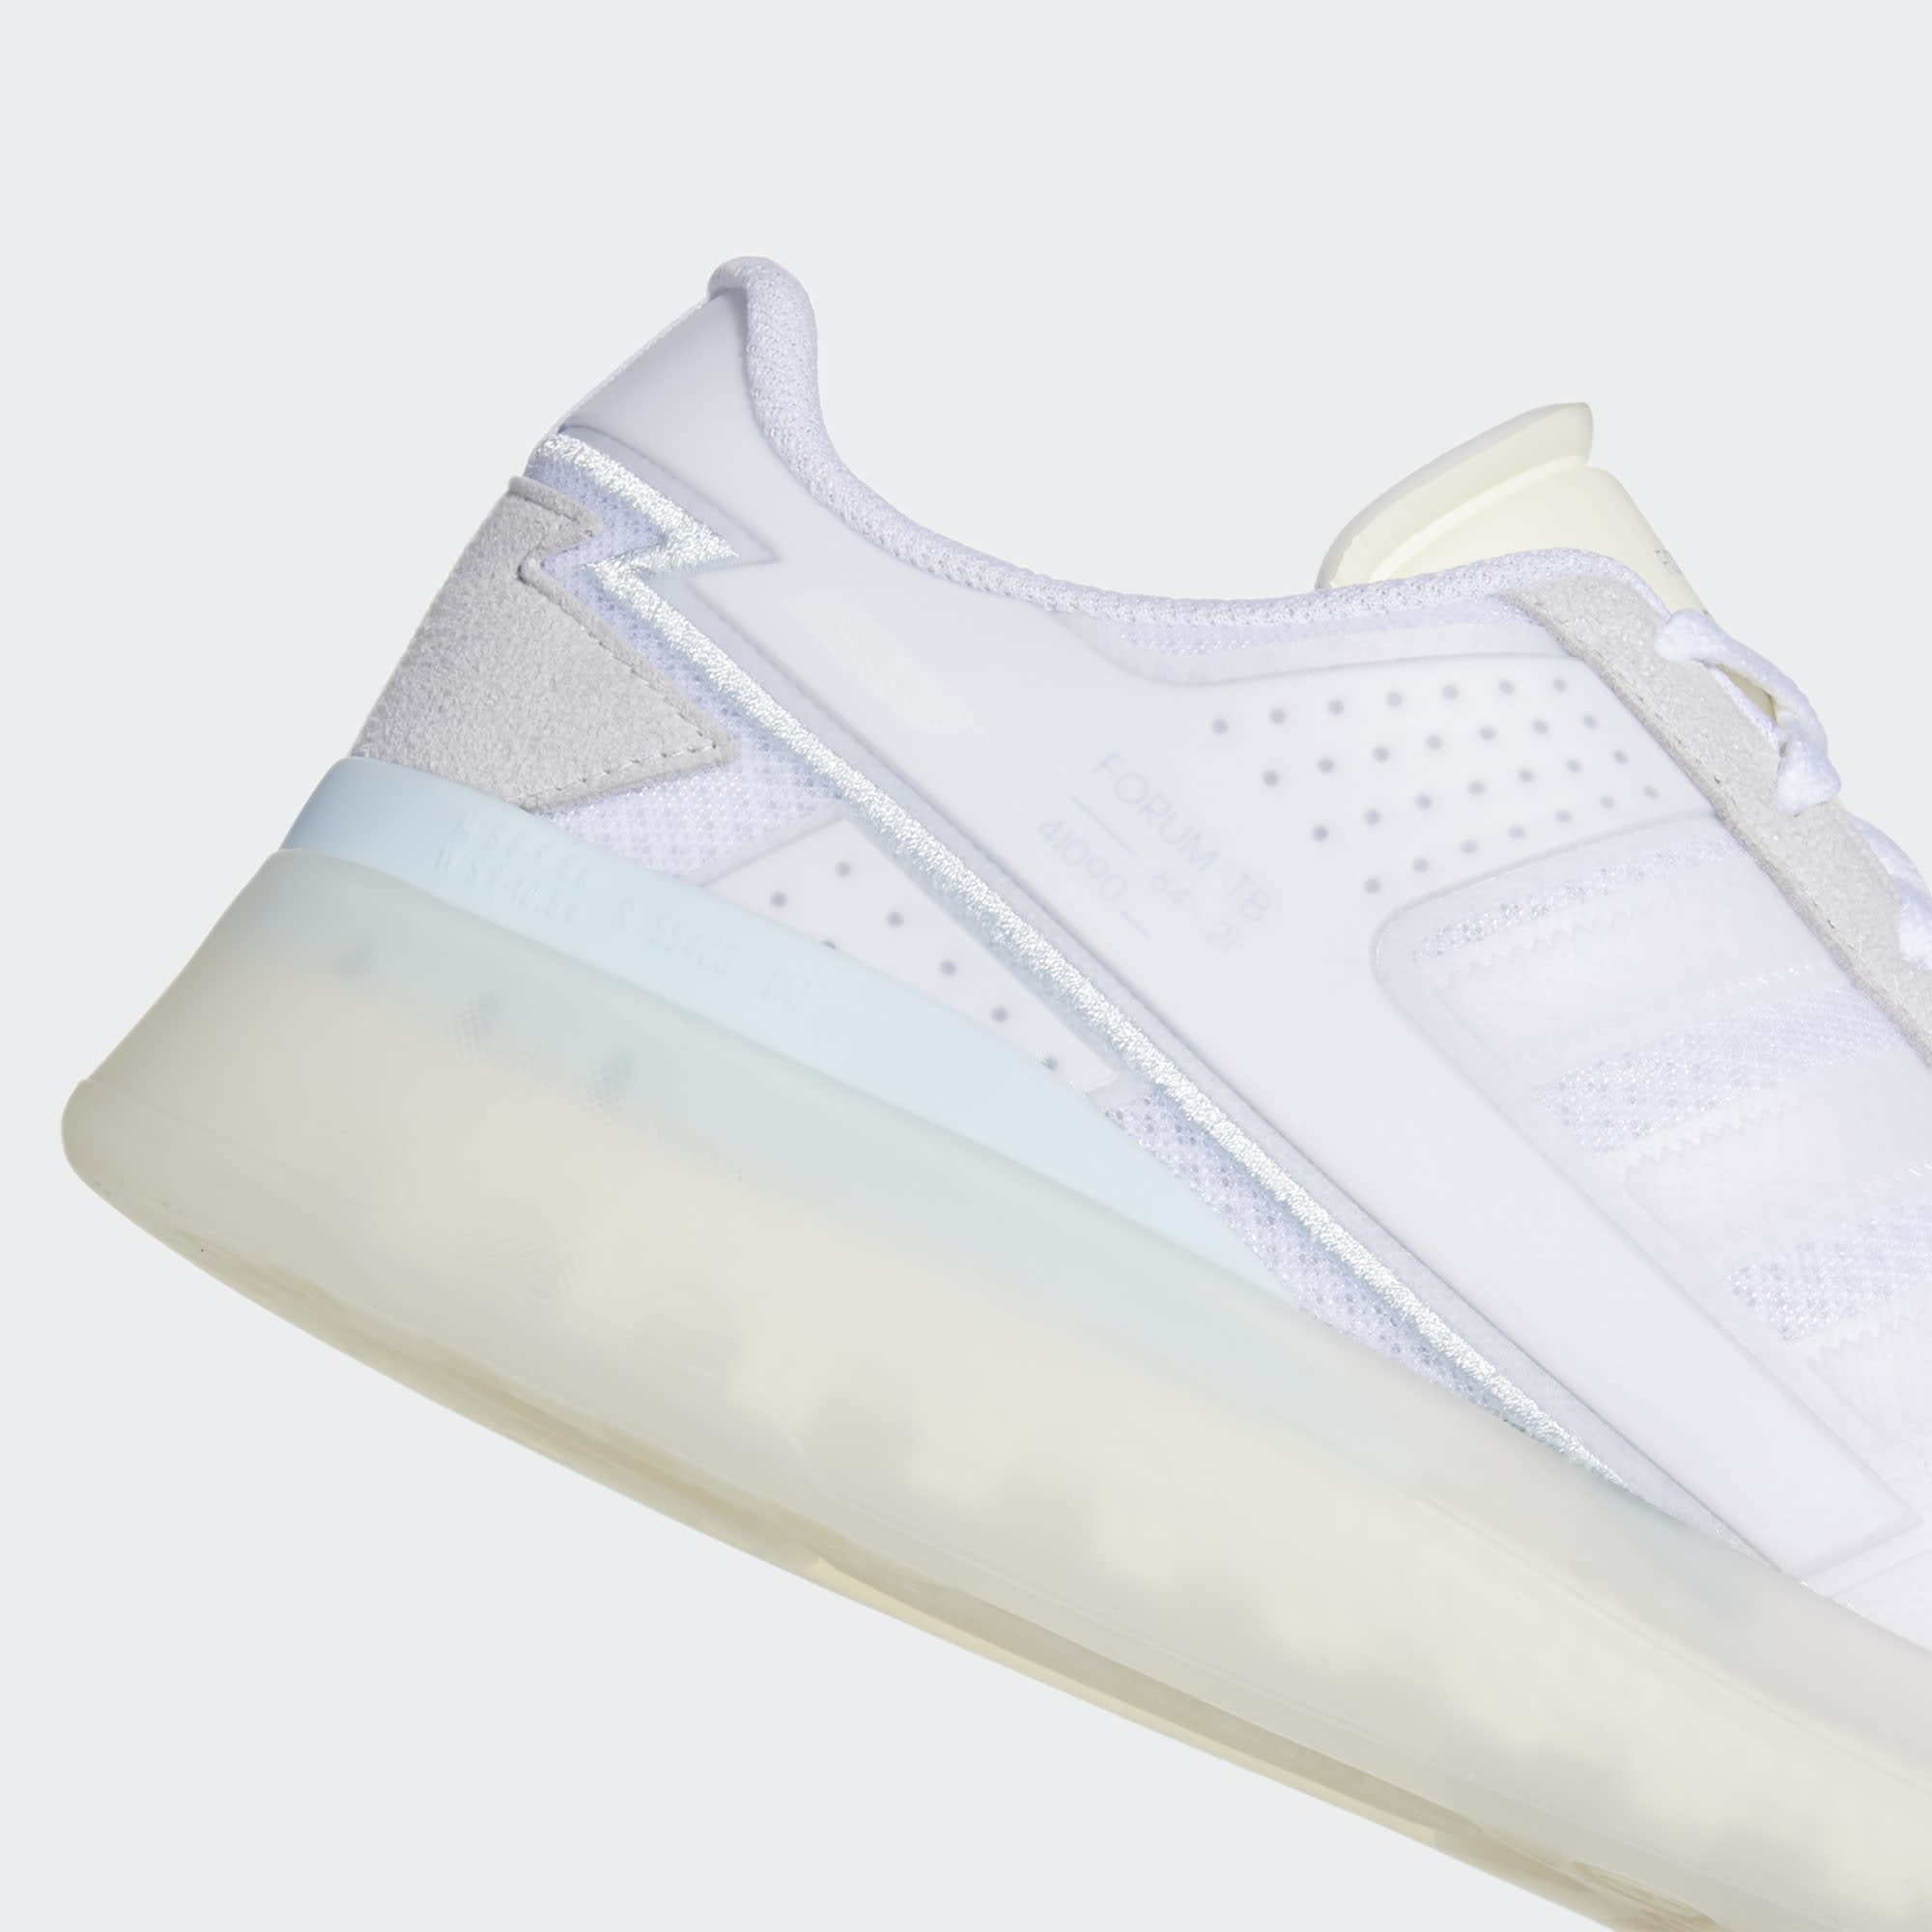 Adidas Forum Low Tech Boost 'Cloud White' Q46357 Heel